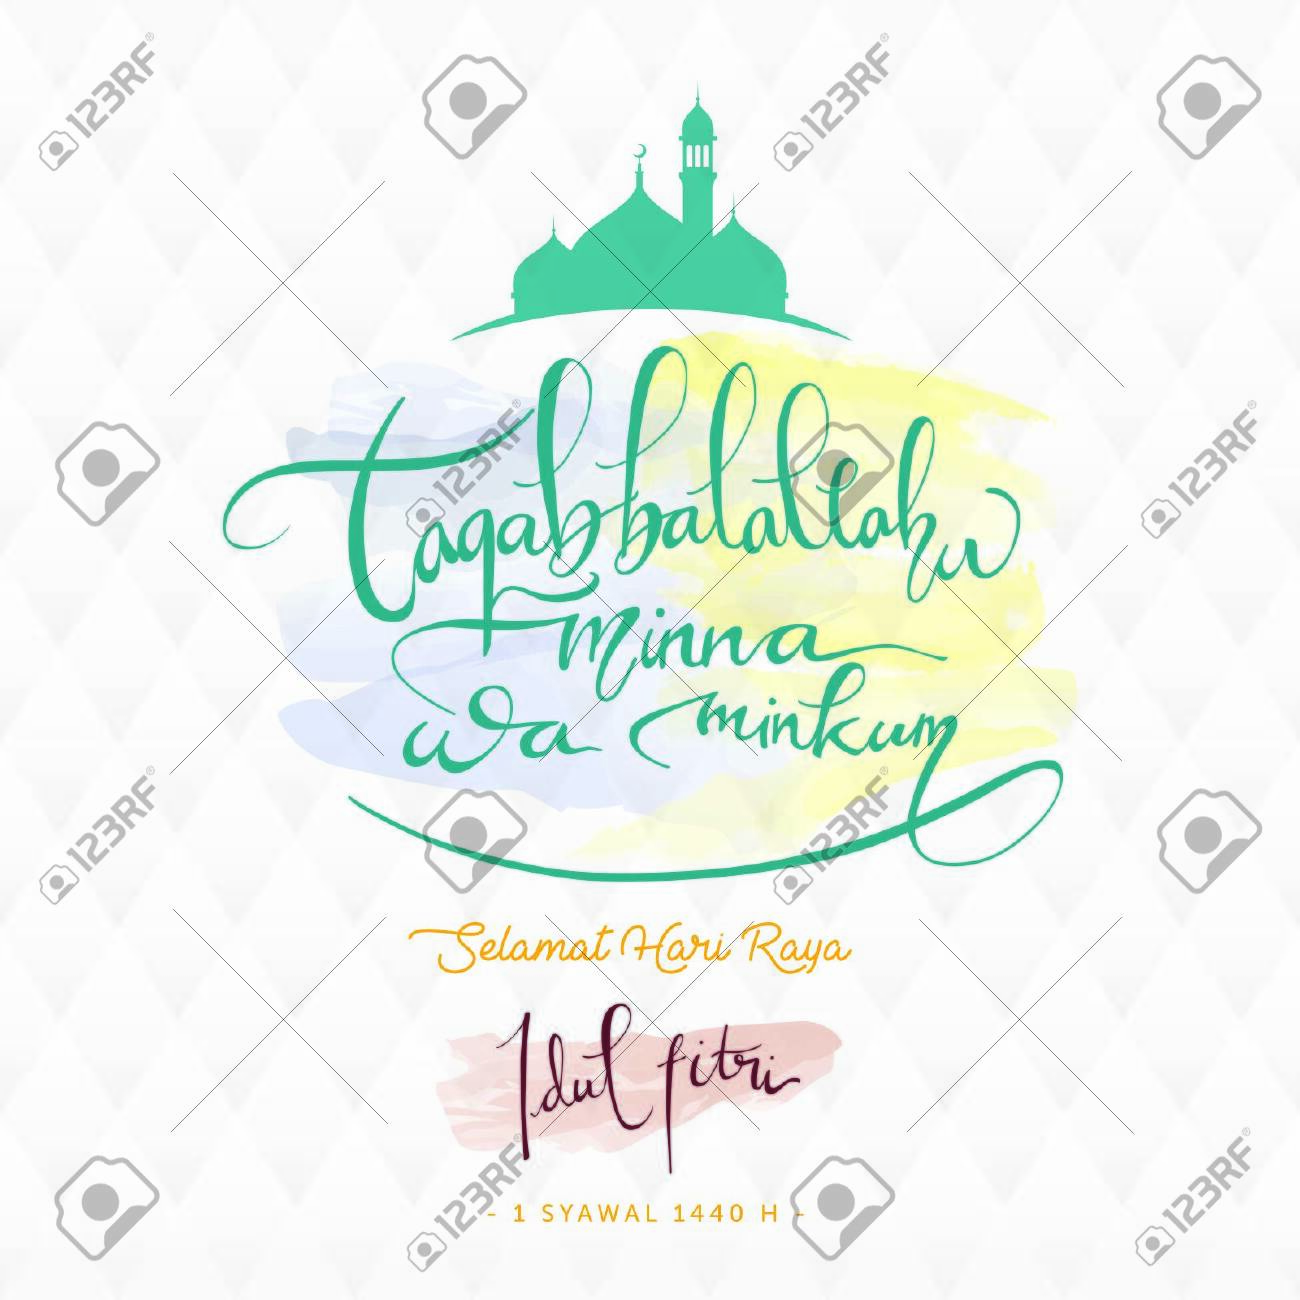 Ramadhan Idul Fitri Greetings Vector Art Royalty Free Cliparts